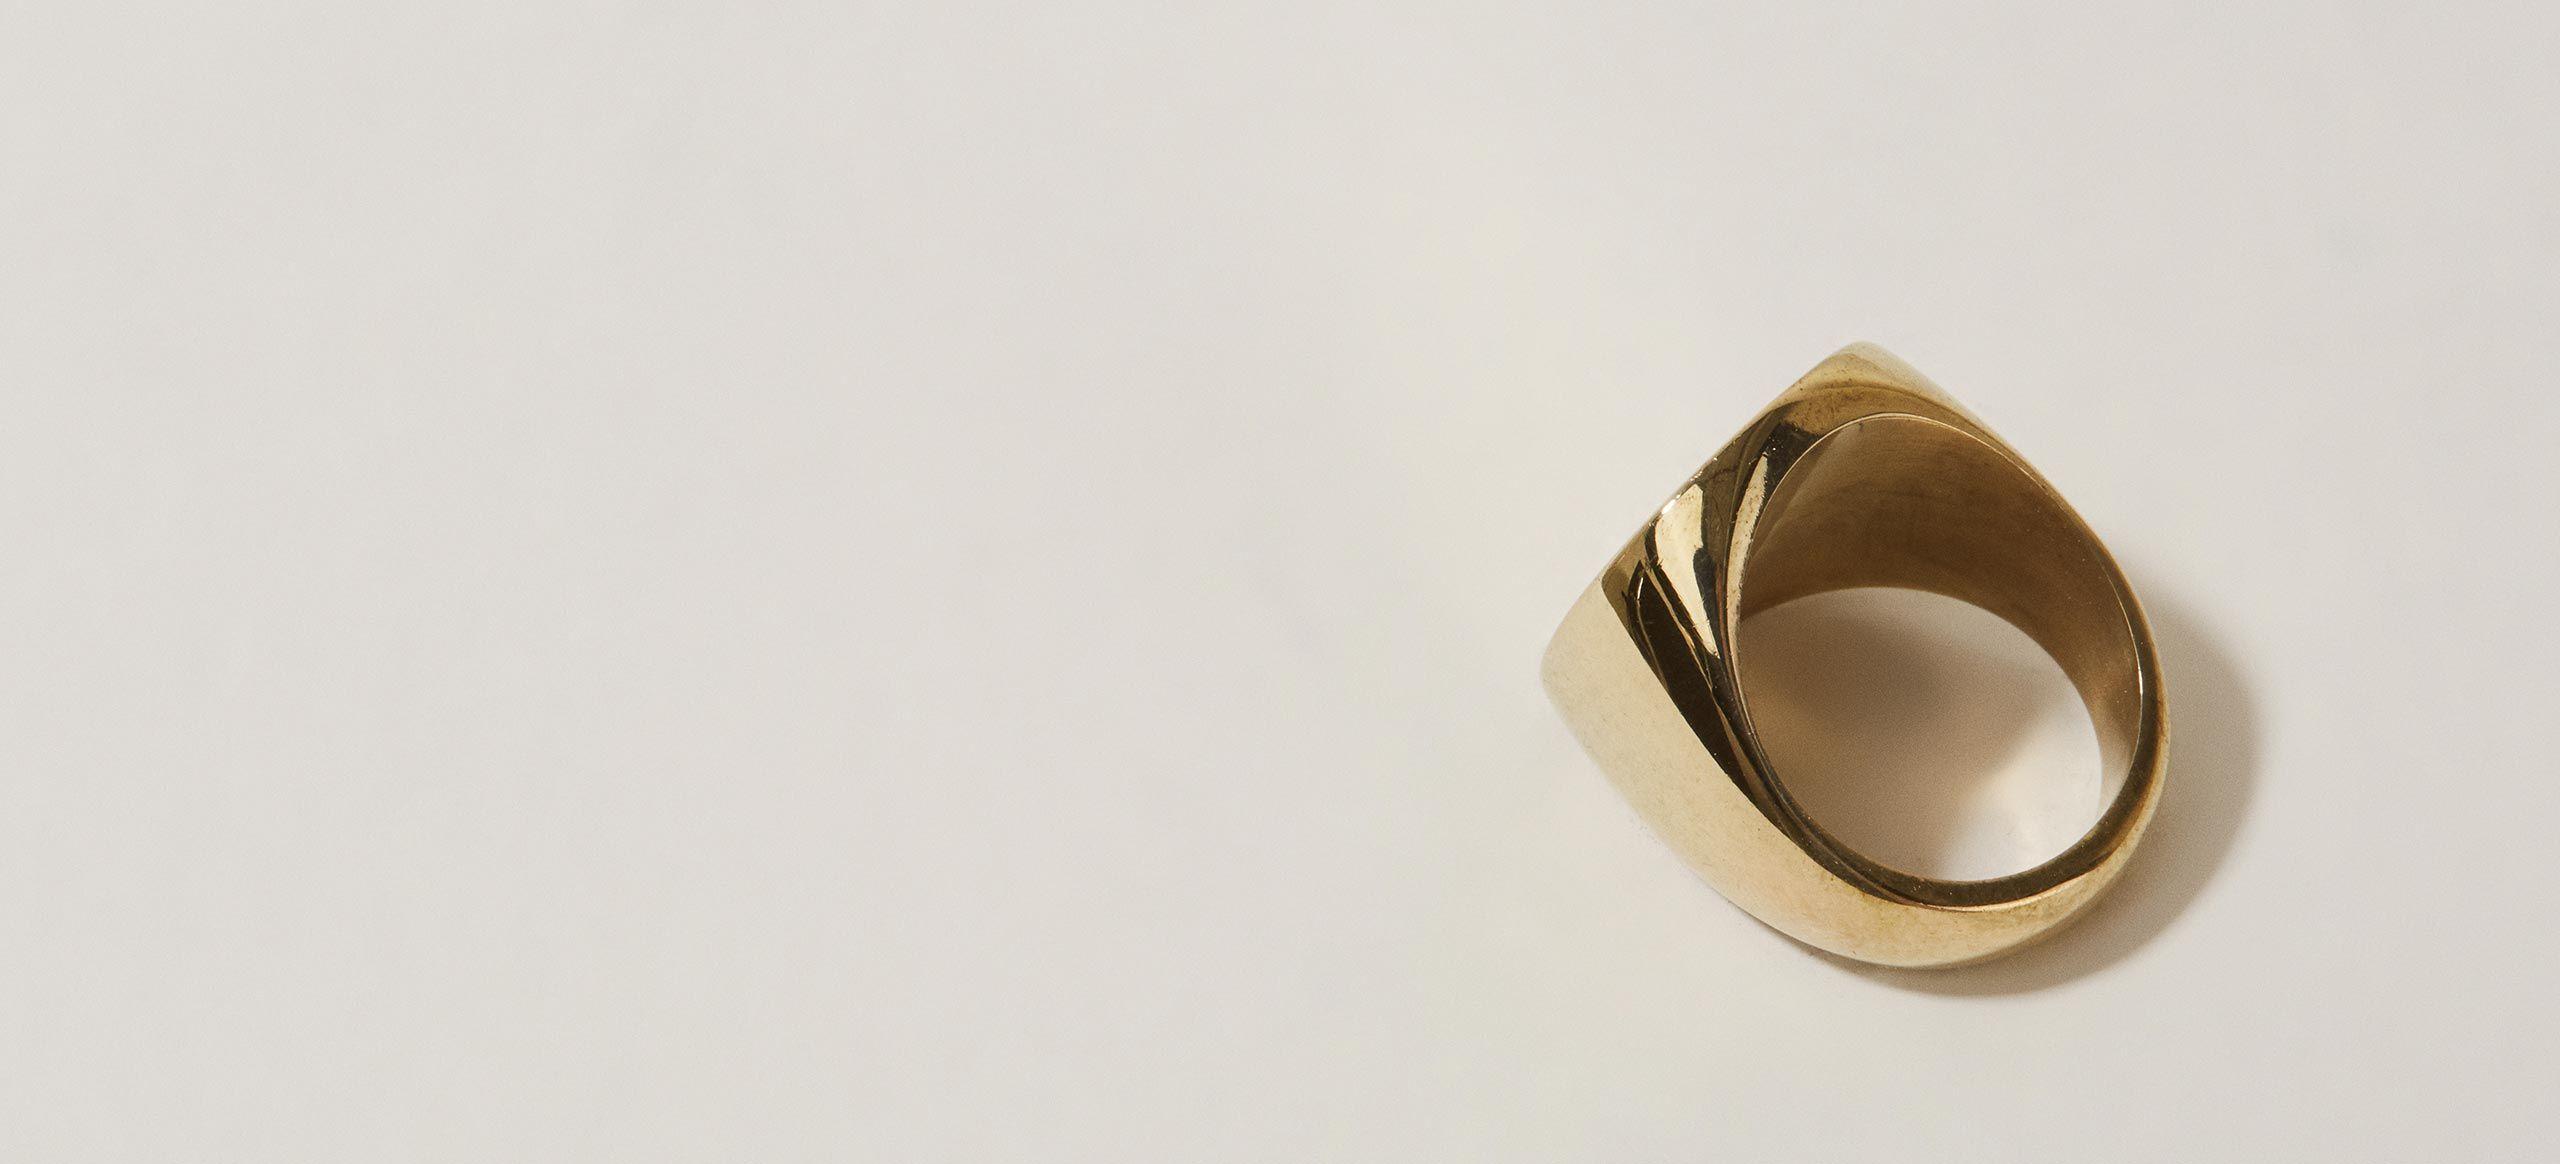 Soko Square Signet Ring wp5ps2oK